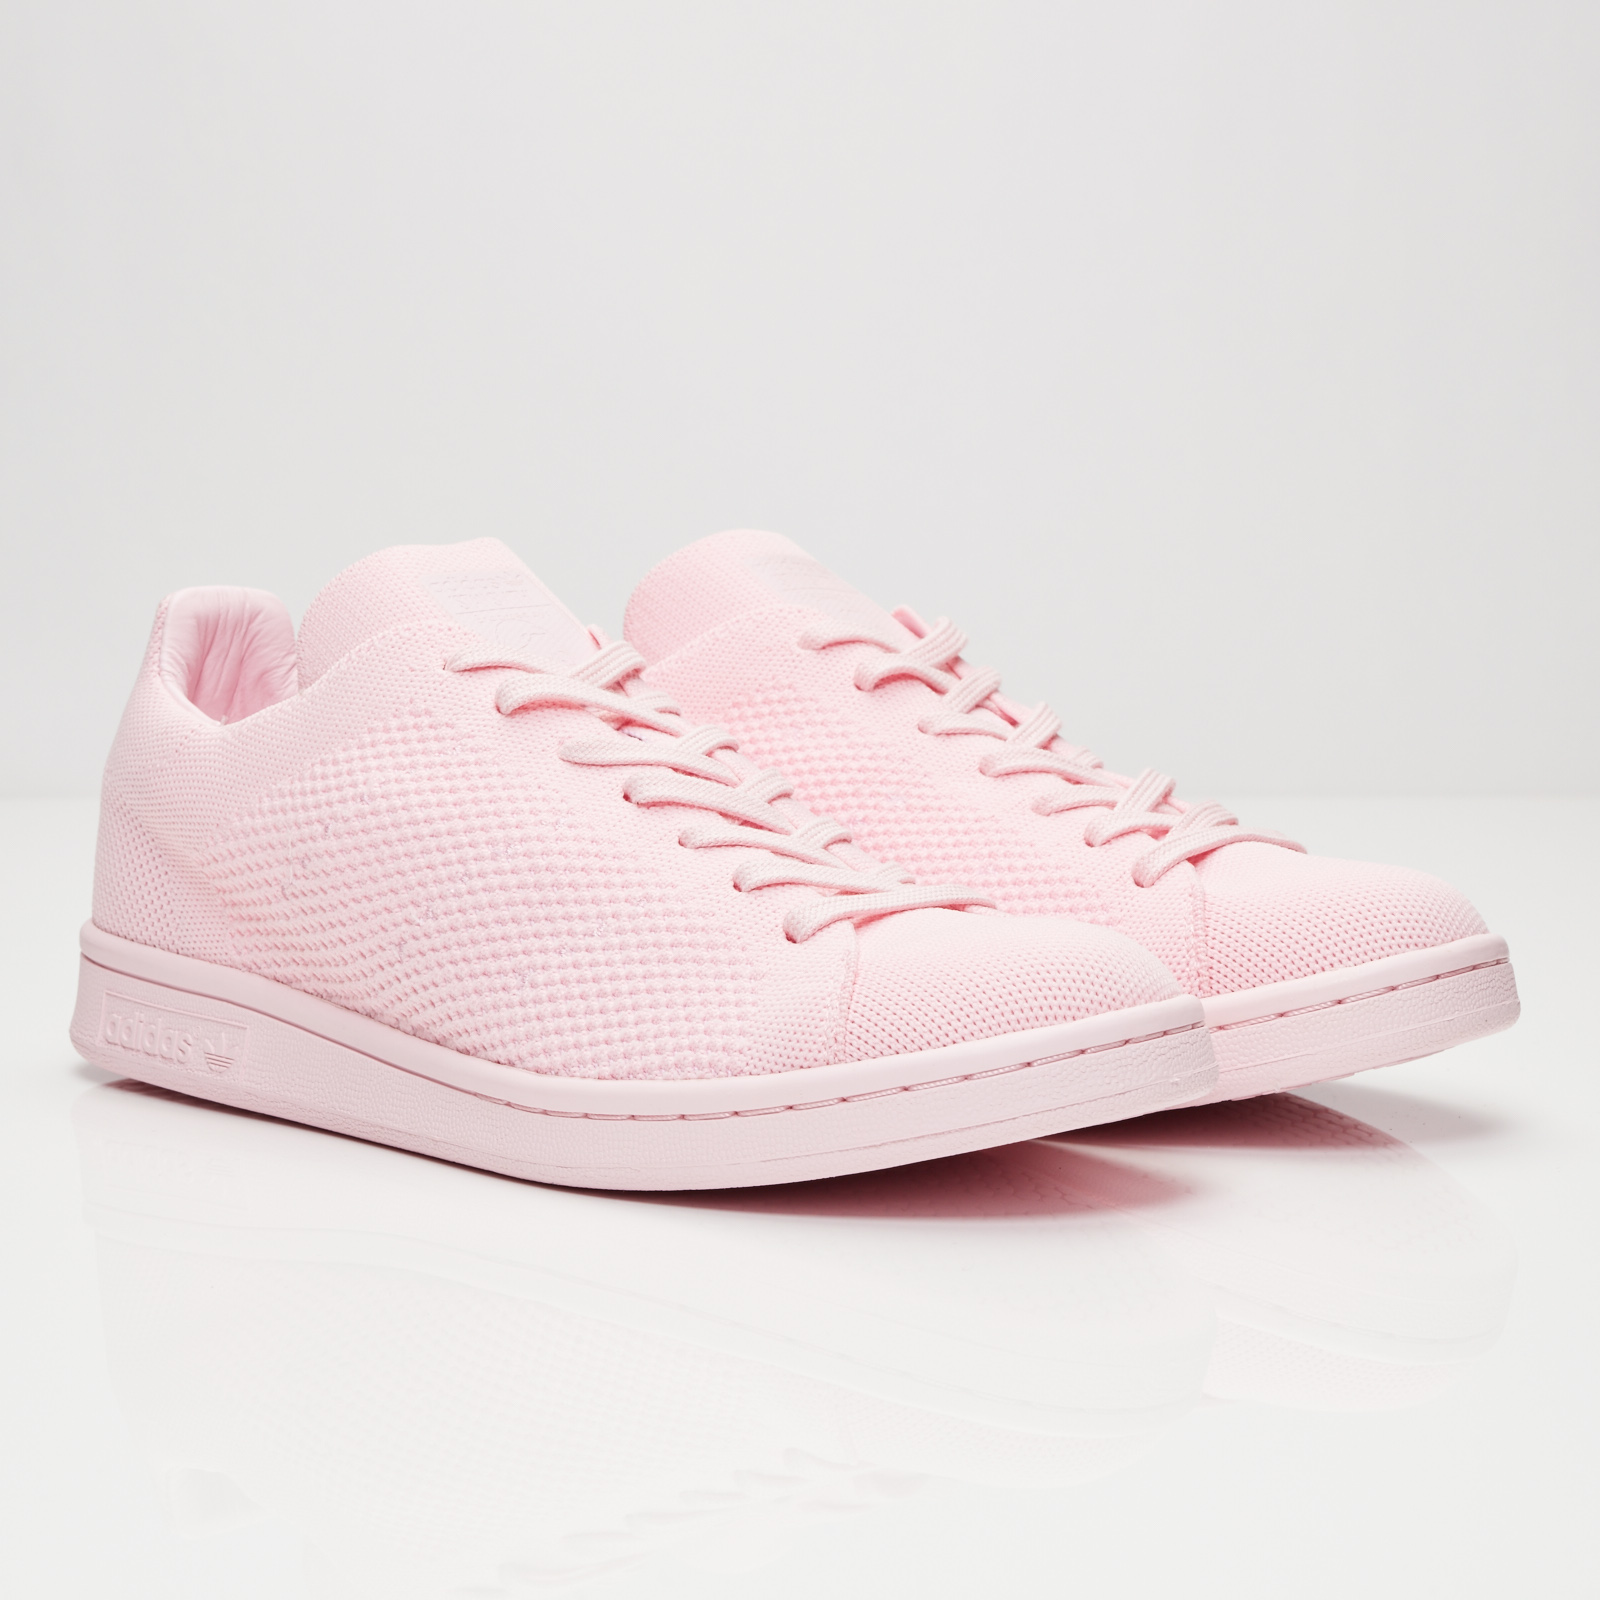 superior quality a666c 4352b adidas Stan Smith Primeknit - S80064 - Sneakersnstuff ...